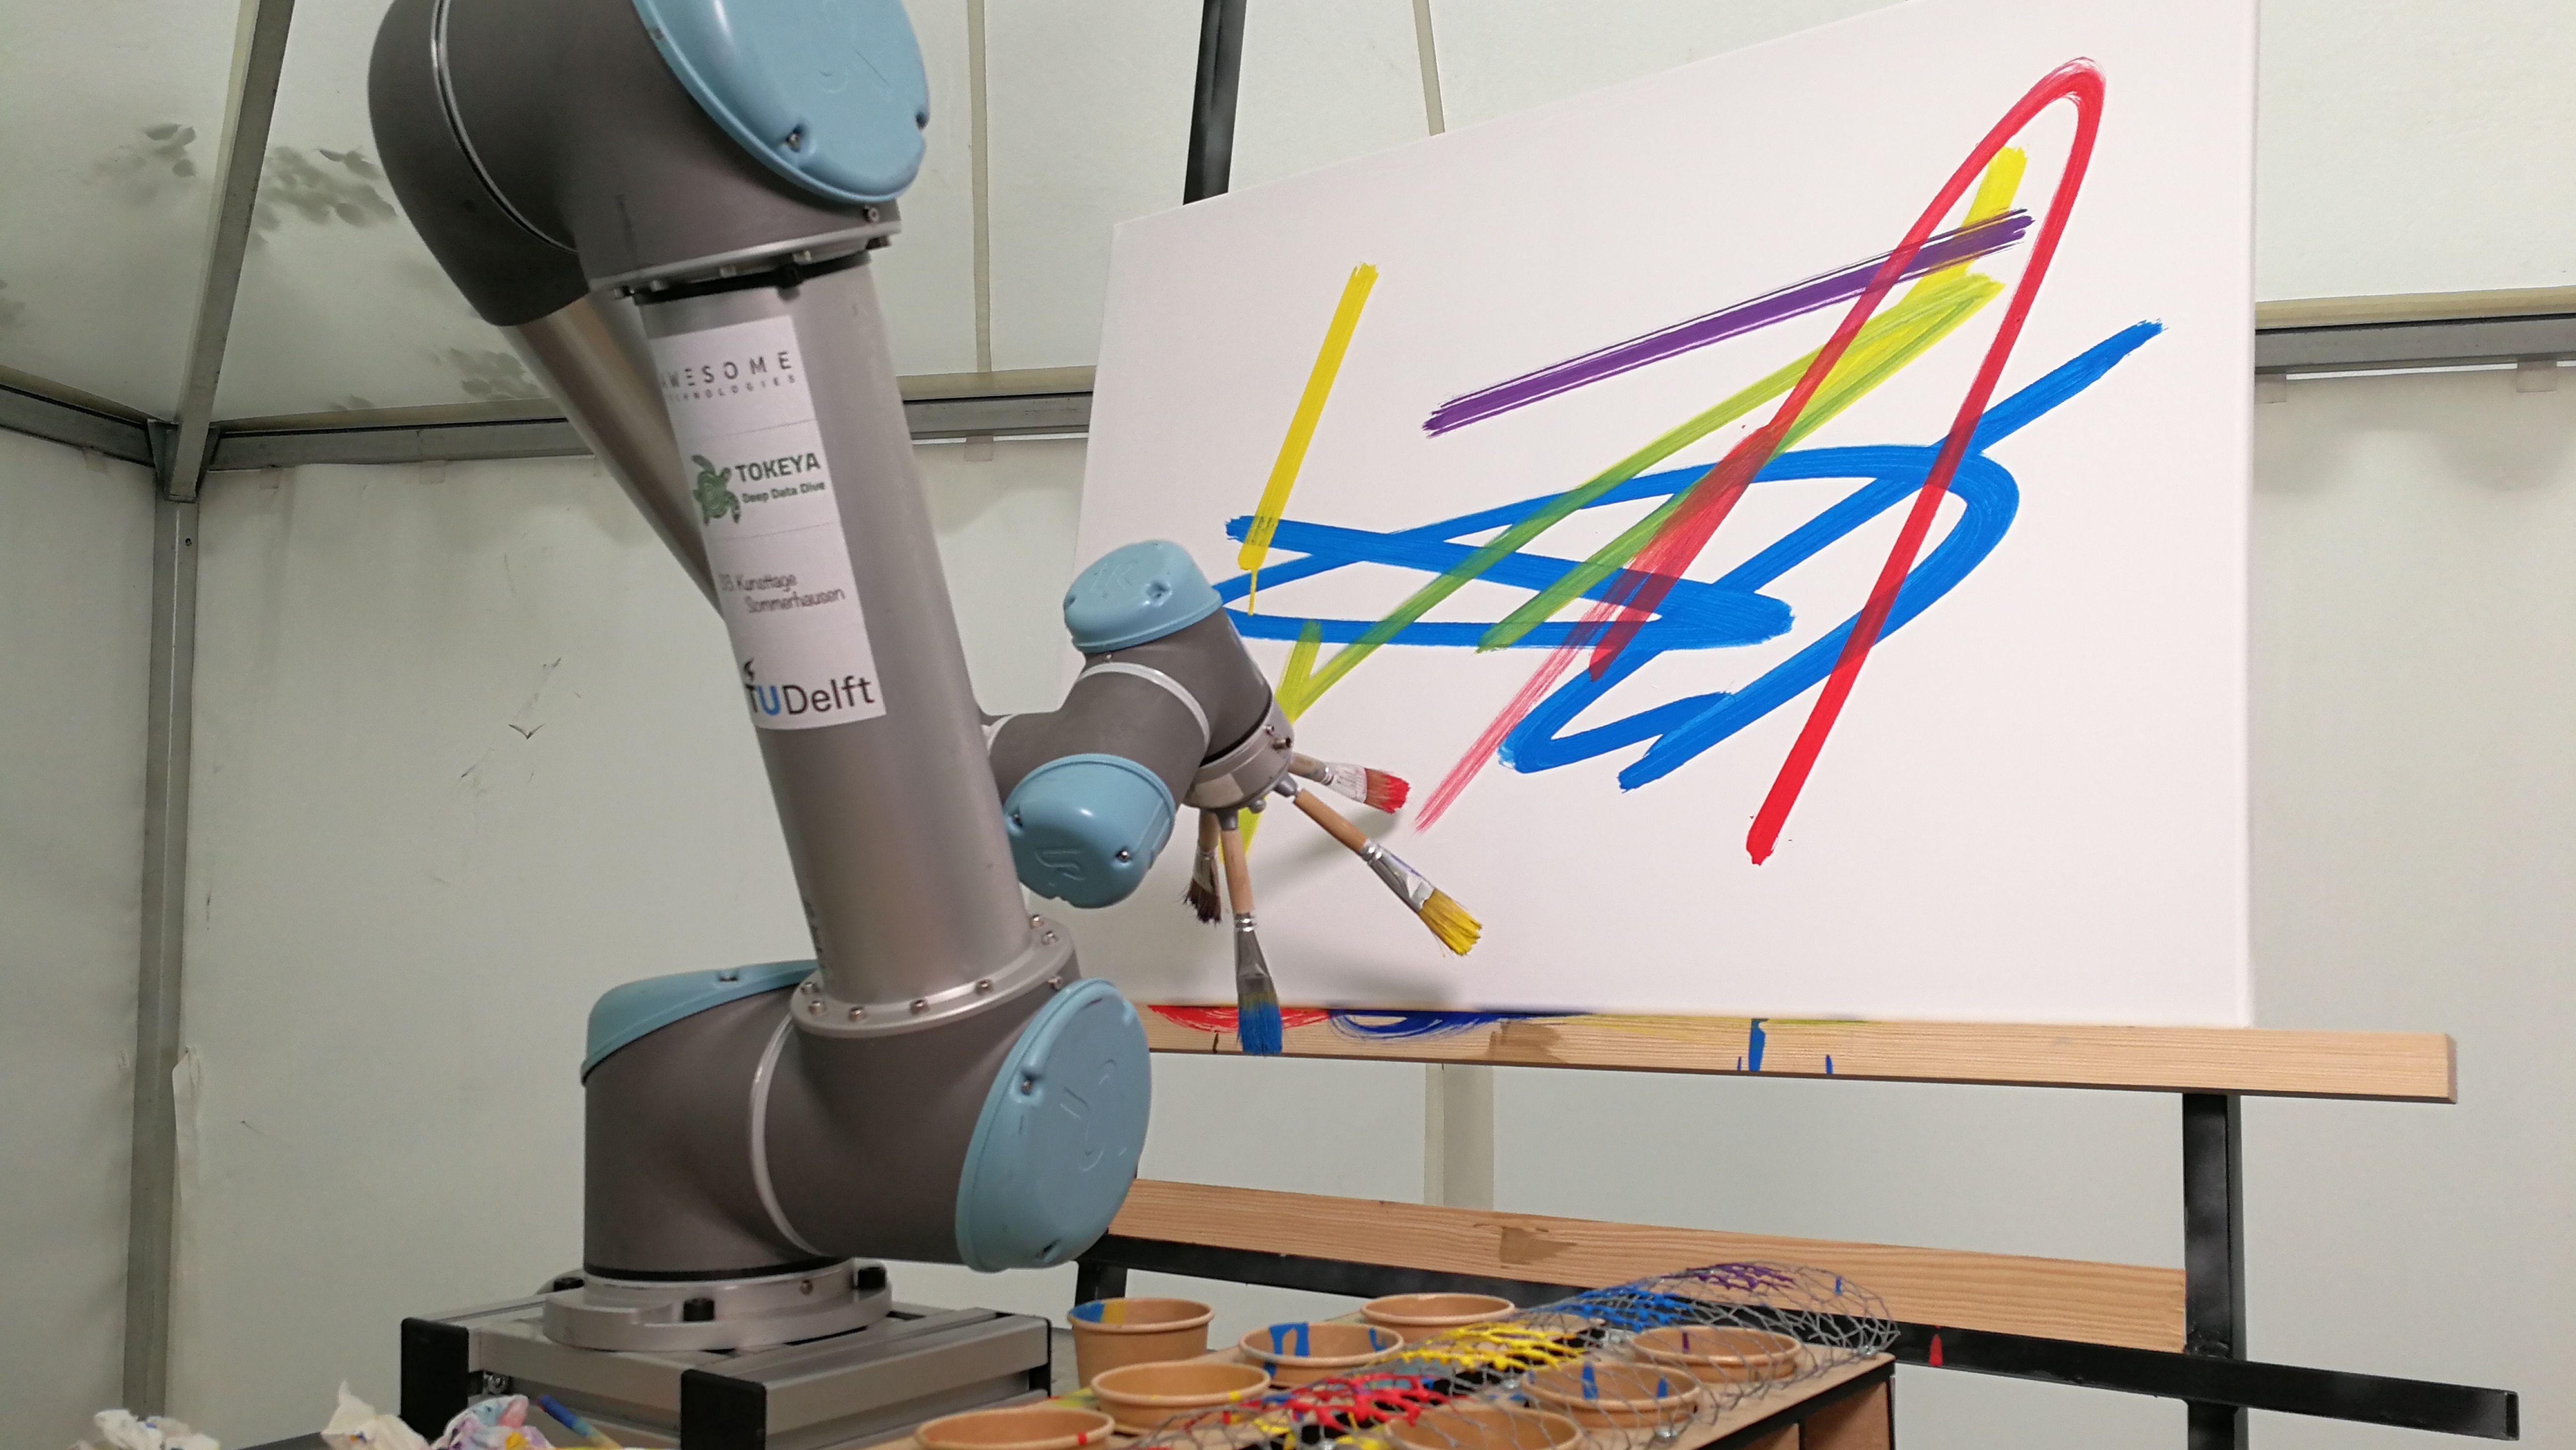 Malender Roboter in Sommerhausen